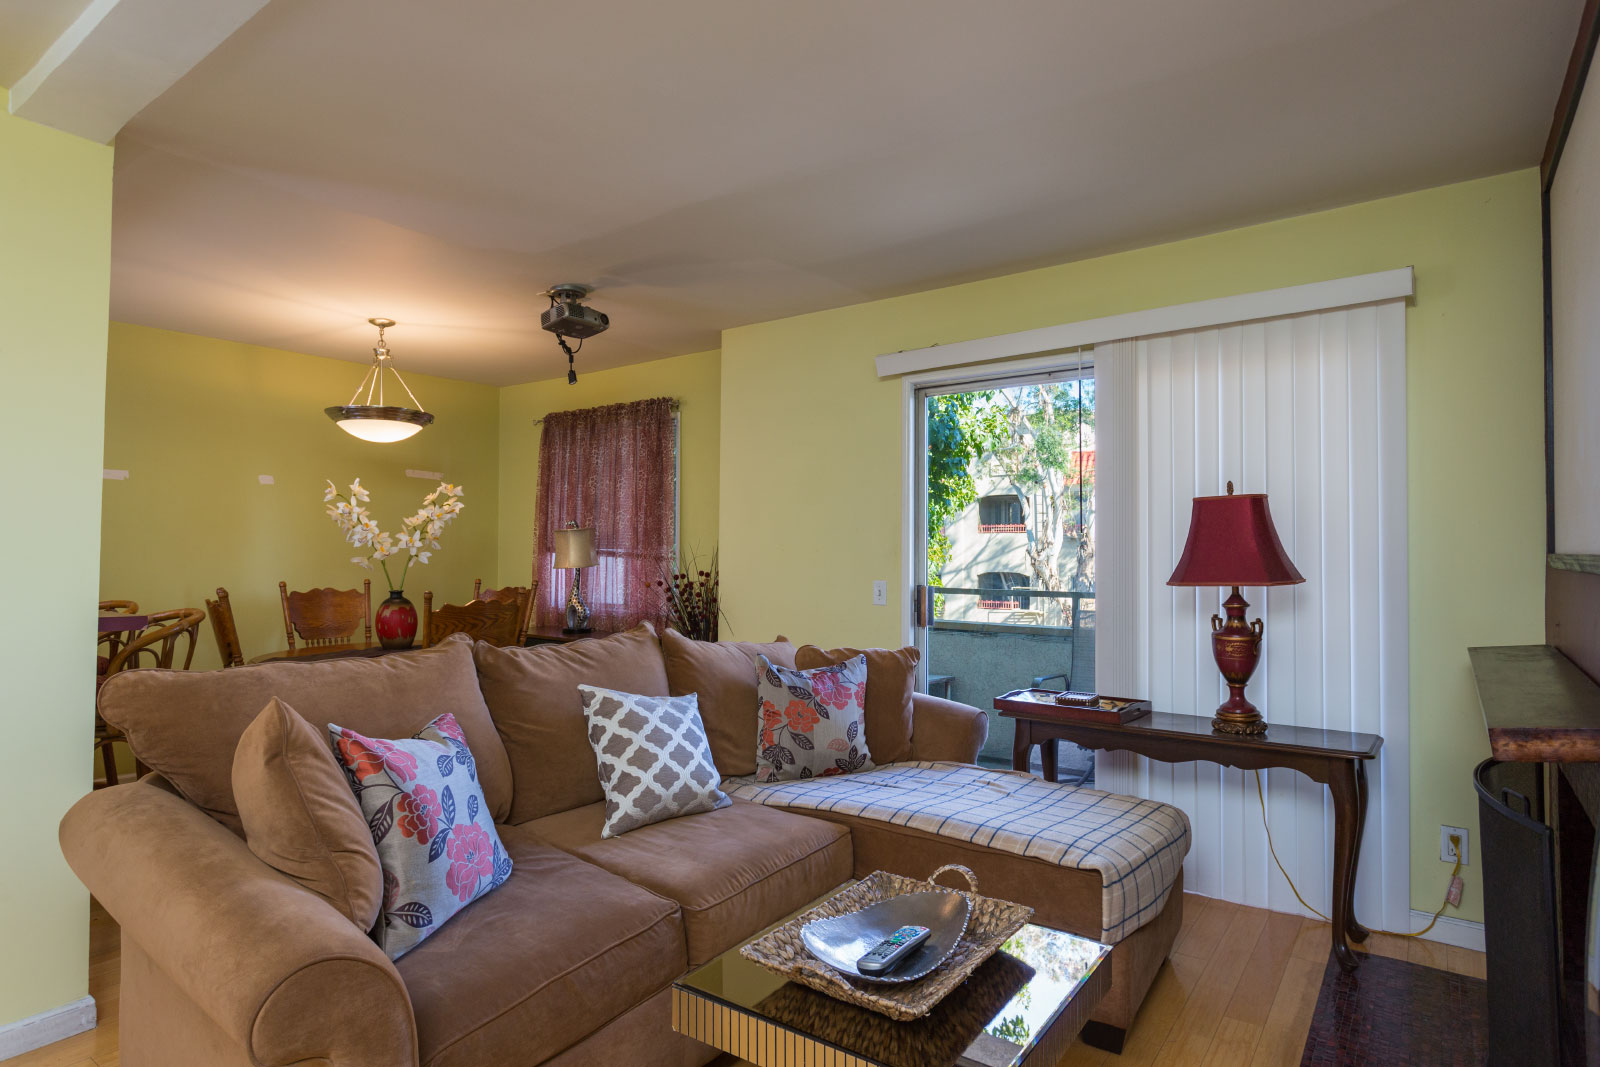 645 CHESTNUT AVE #214 LONG BEACH, CA 90802   2 bed / 2 bath / 963 sq ft